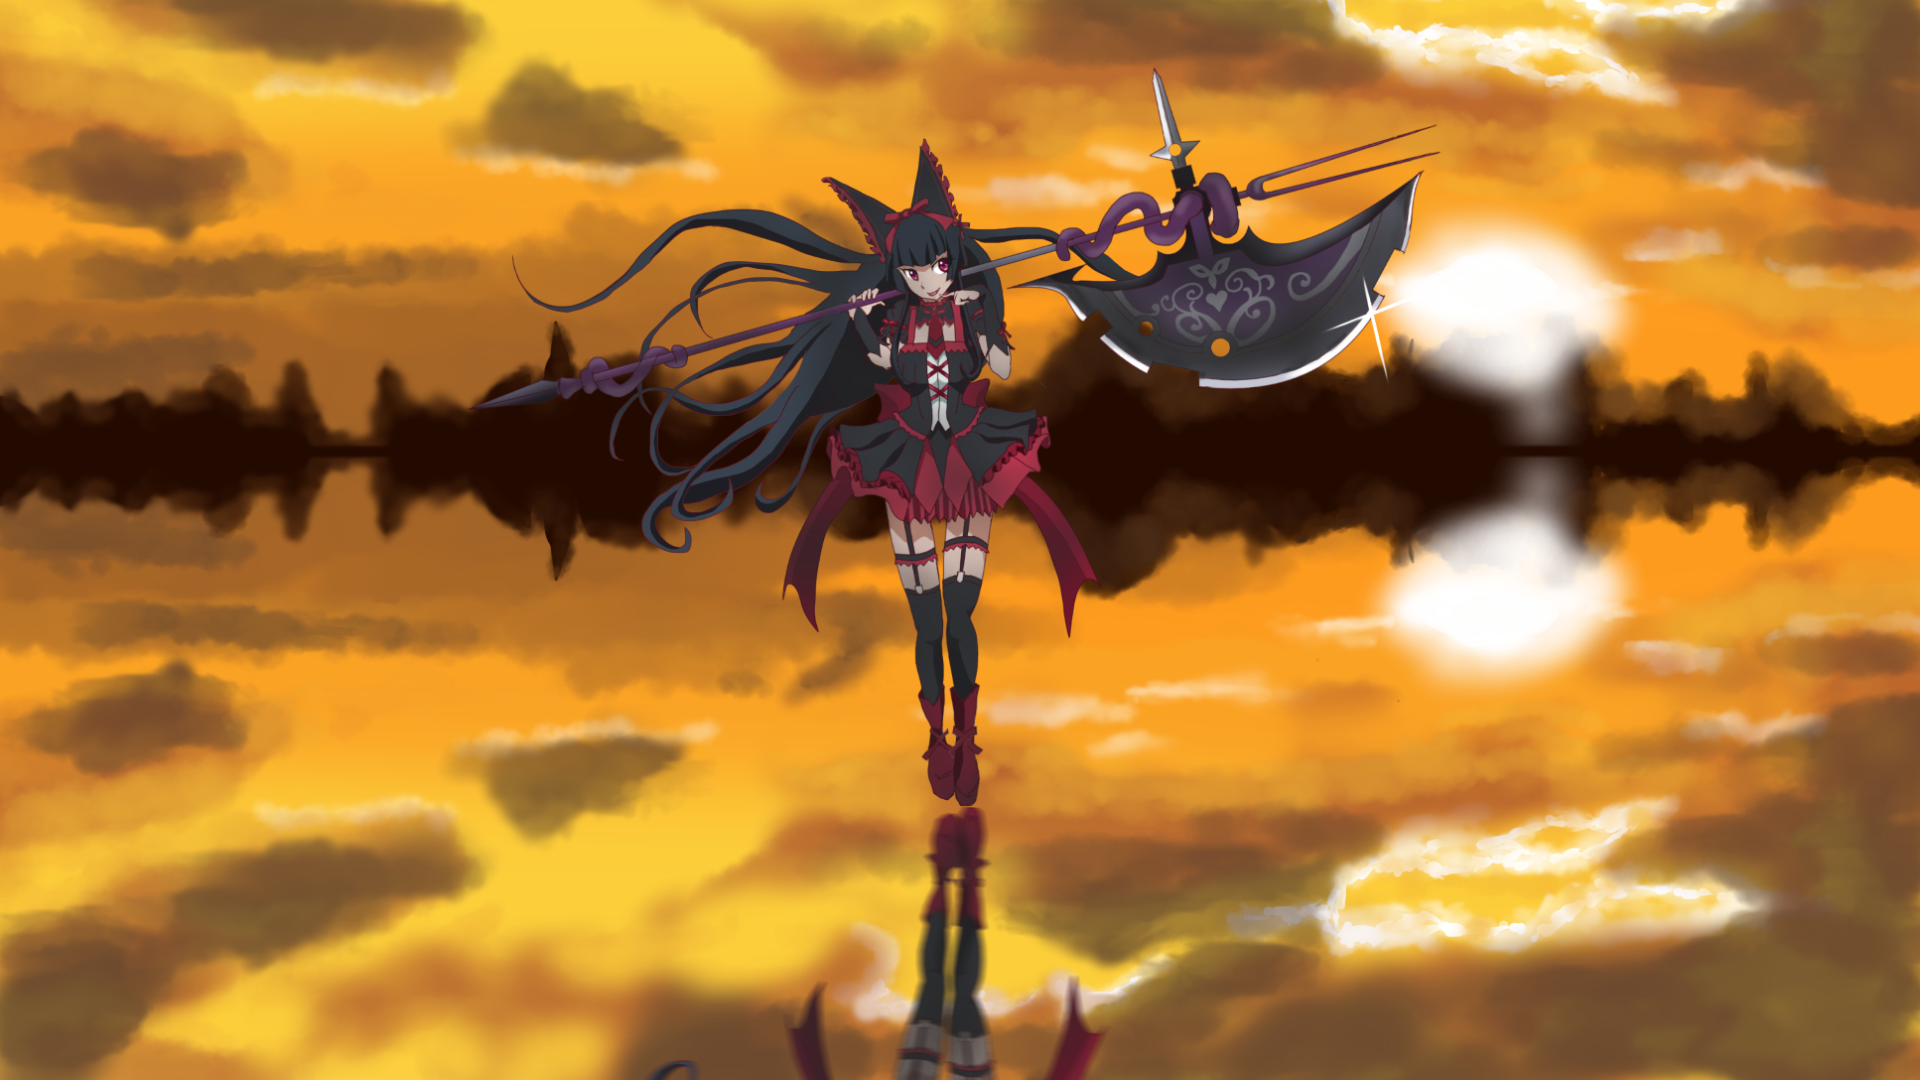 Anime Gate Jieitai Kanochi Nite Kaku Tatakaeri Rory Mercury